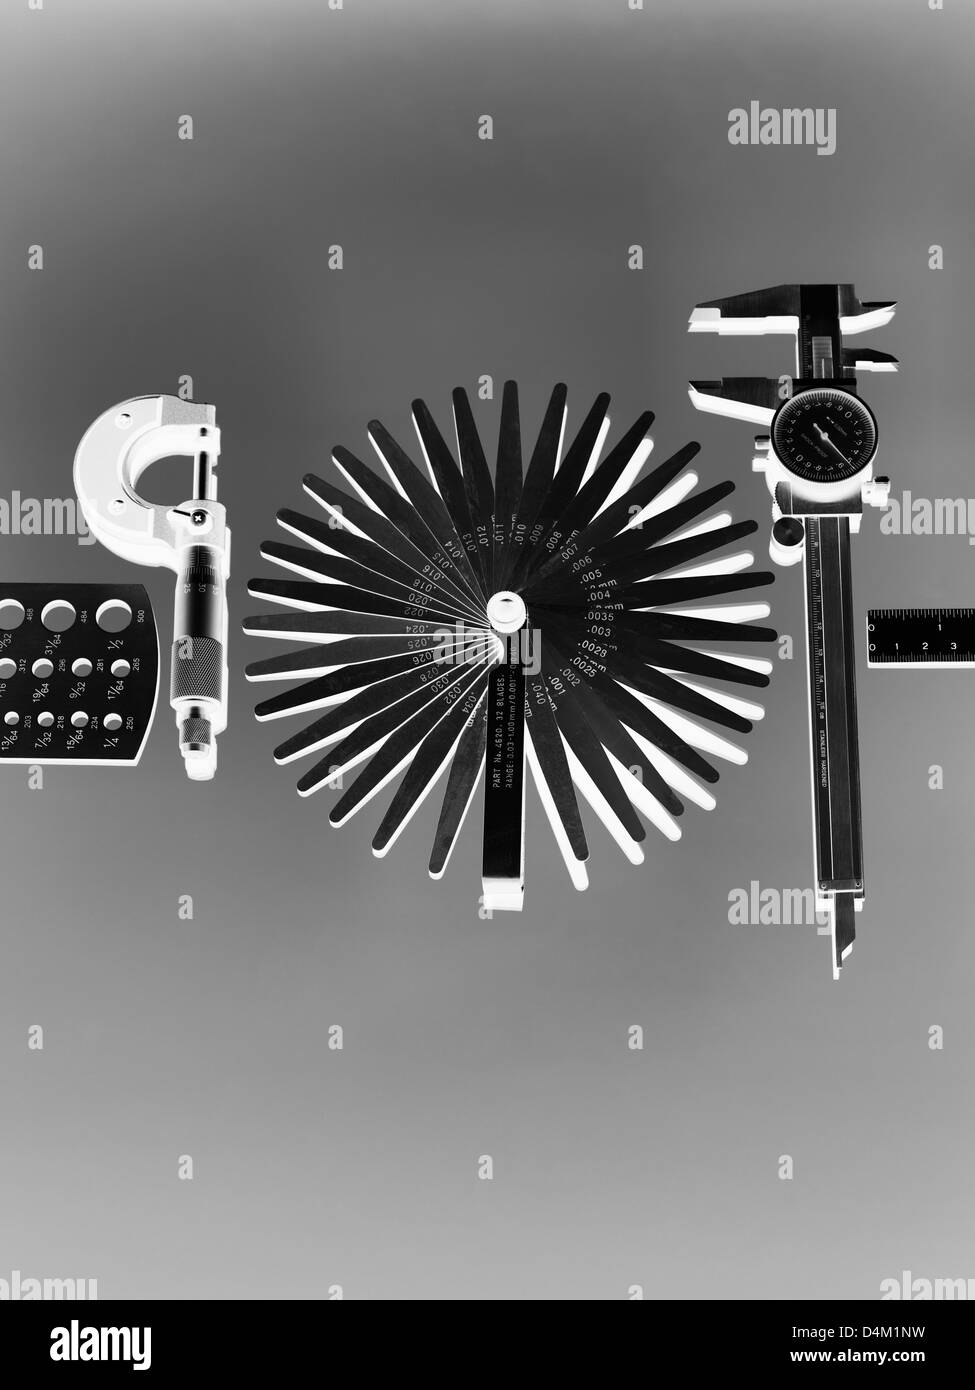 Engineering measurement tools used in Industry - Stock Image